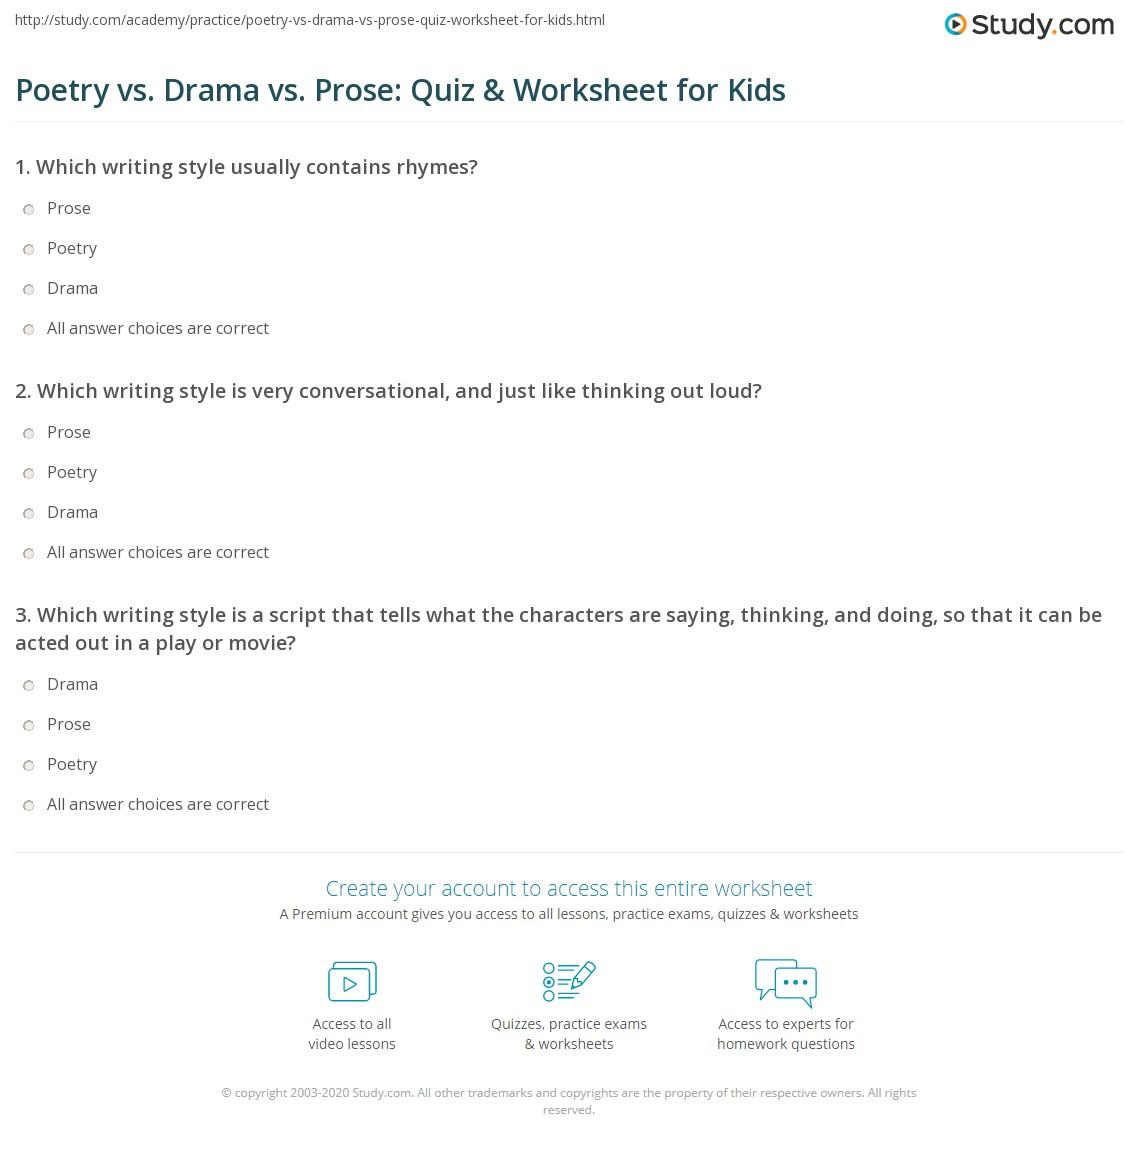 Poetry Vs Drama Vs Prose Quiz Amp Worksheet For Kids